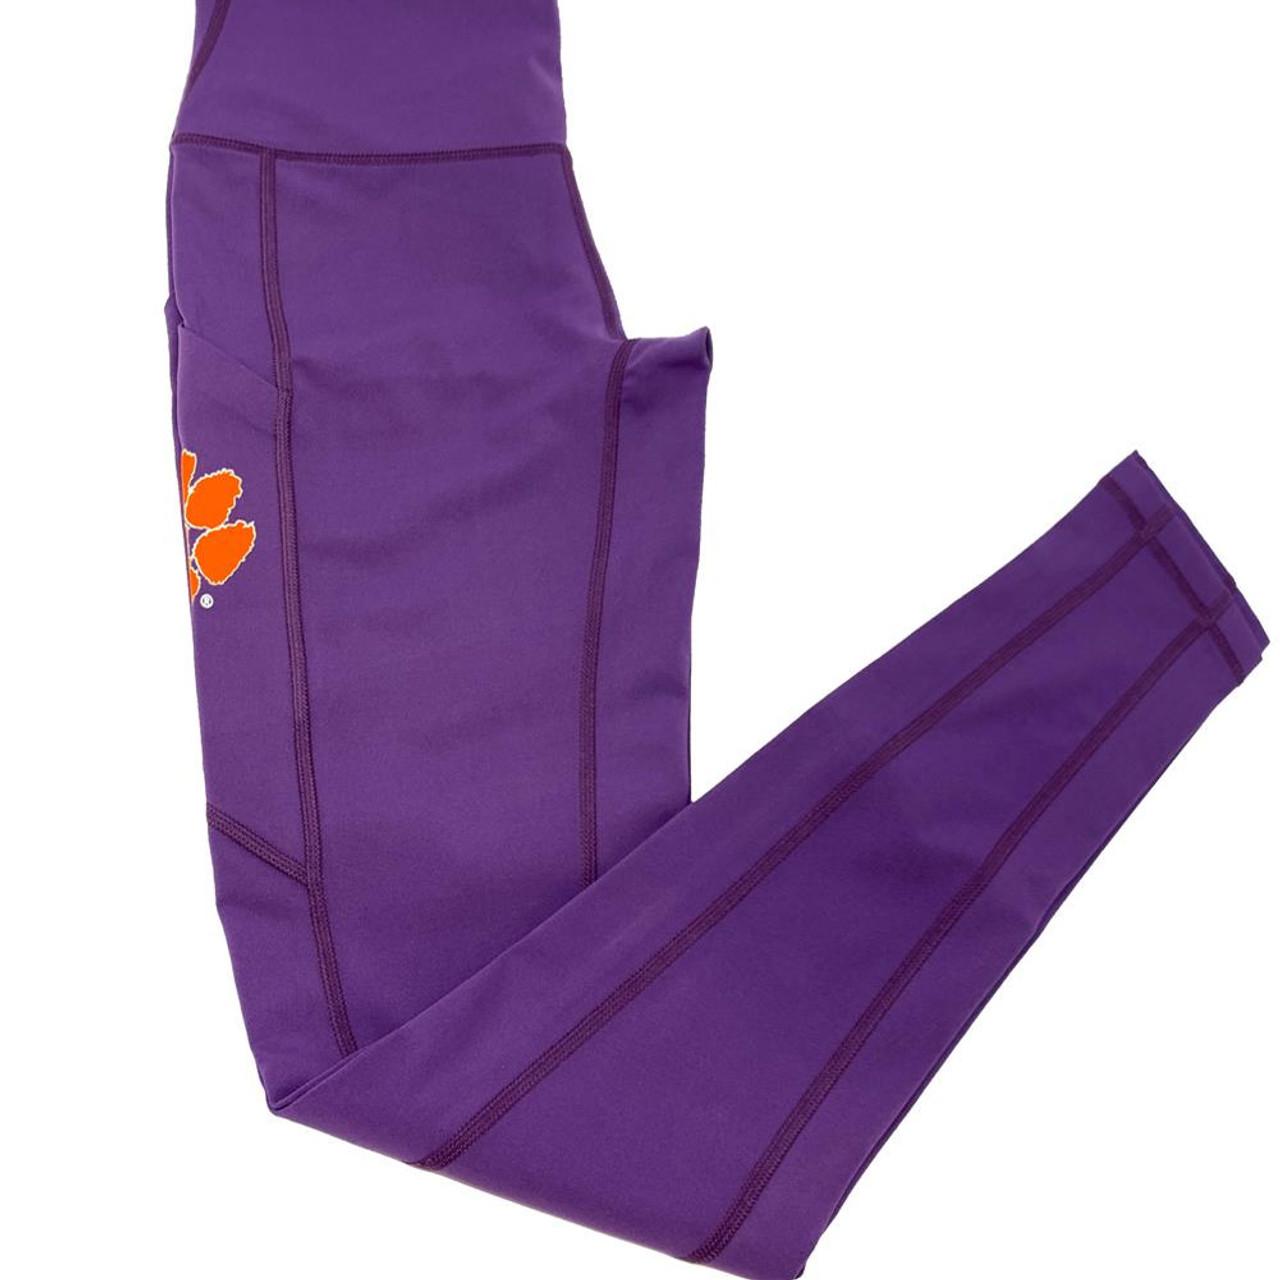 Ladies Alabama Crimson Tide Bama iLeggings Kadyluxe Yoga Pants